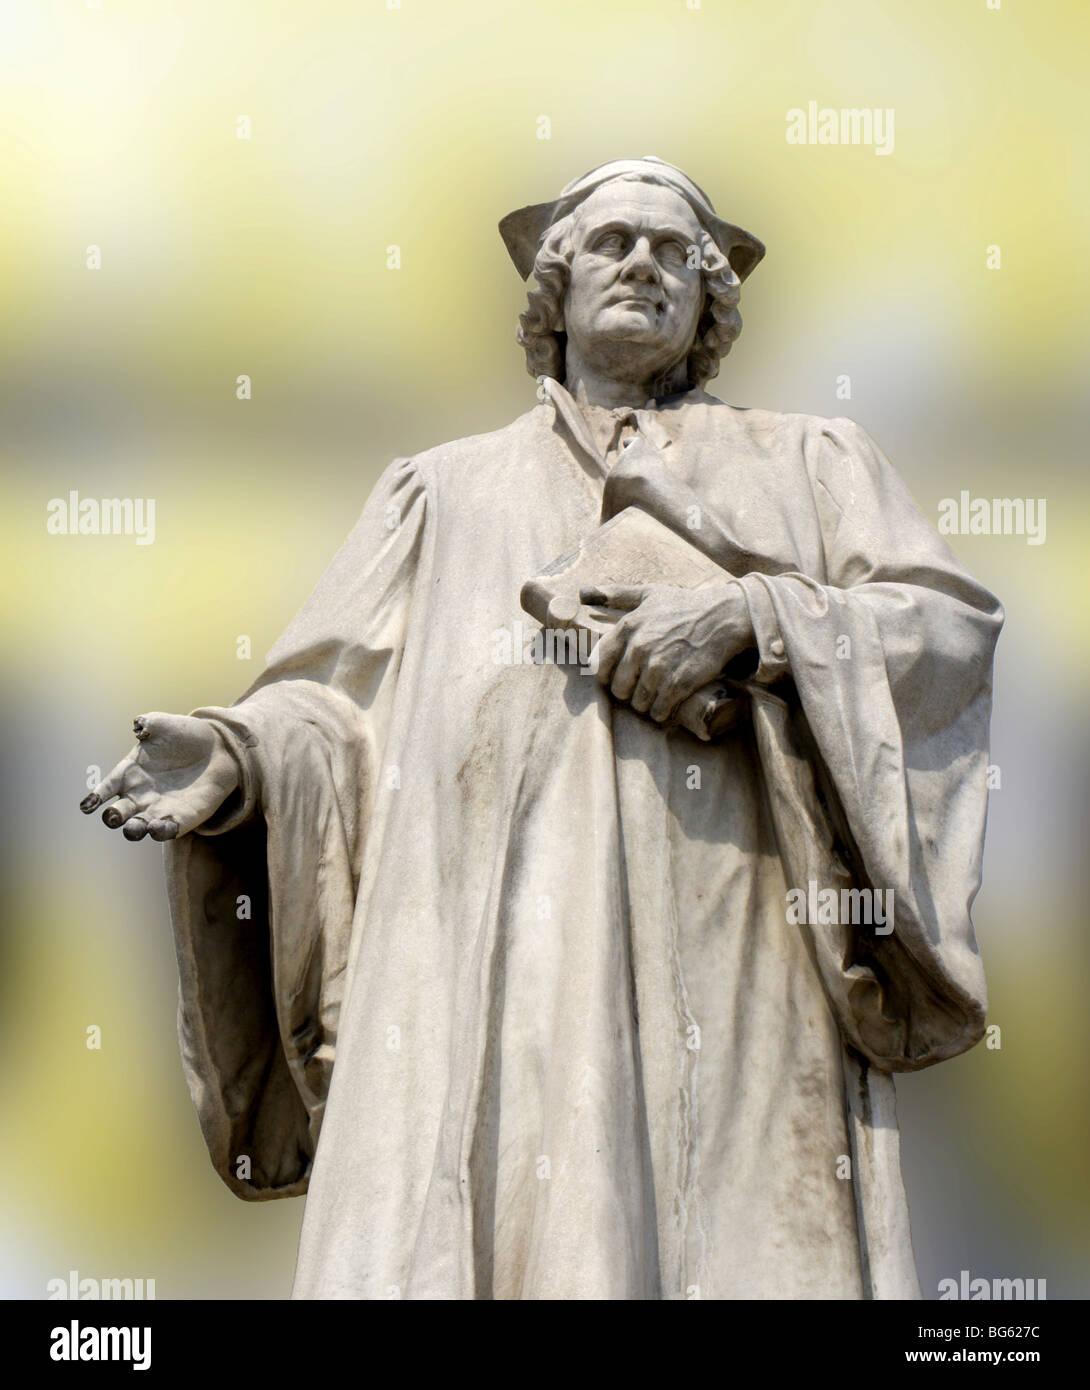 bramante - statue from vienna museum Stock Photo